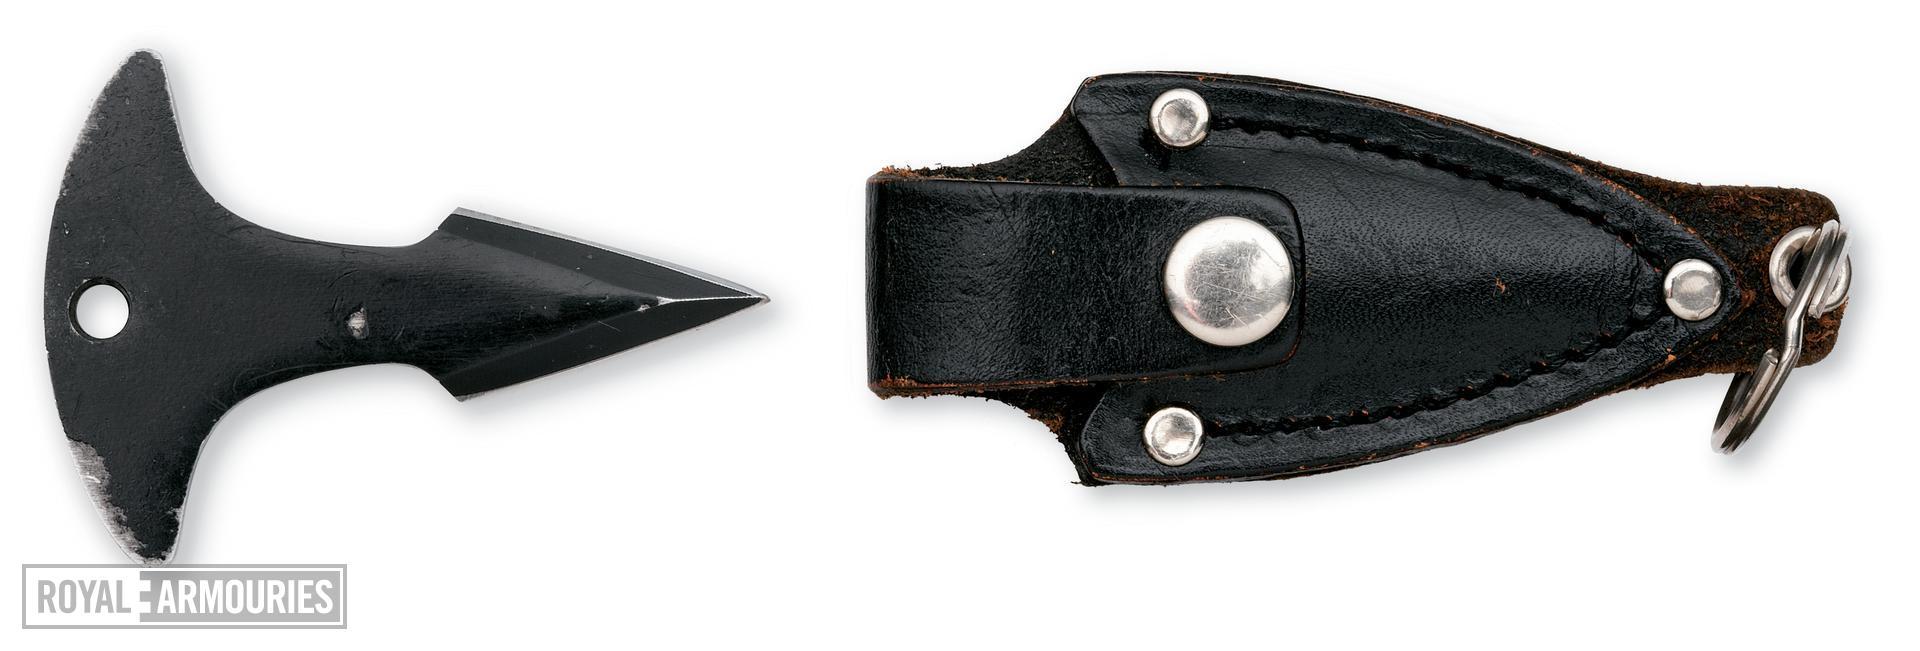 Punch dagger key-ring and sheath